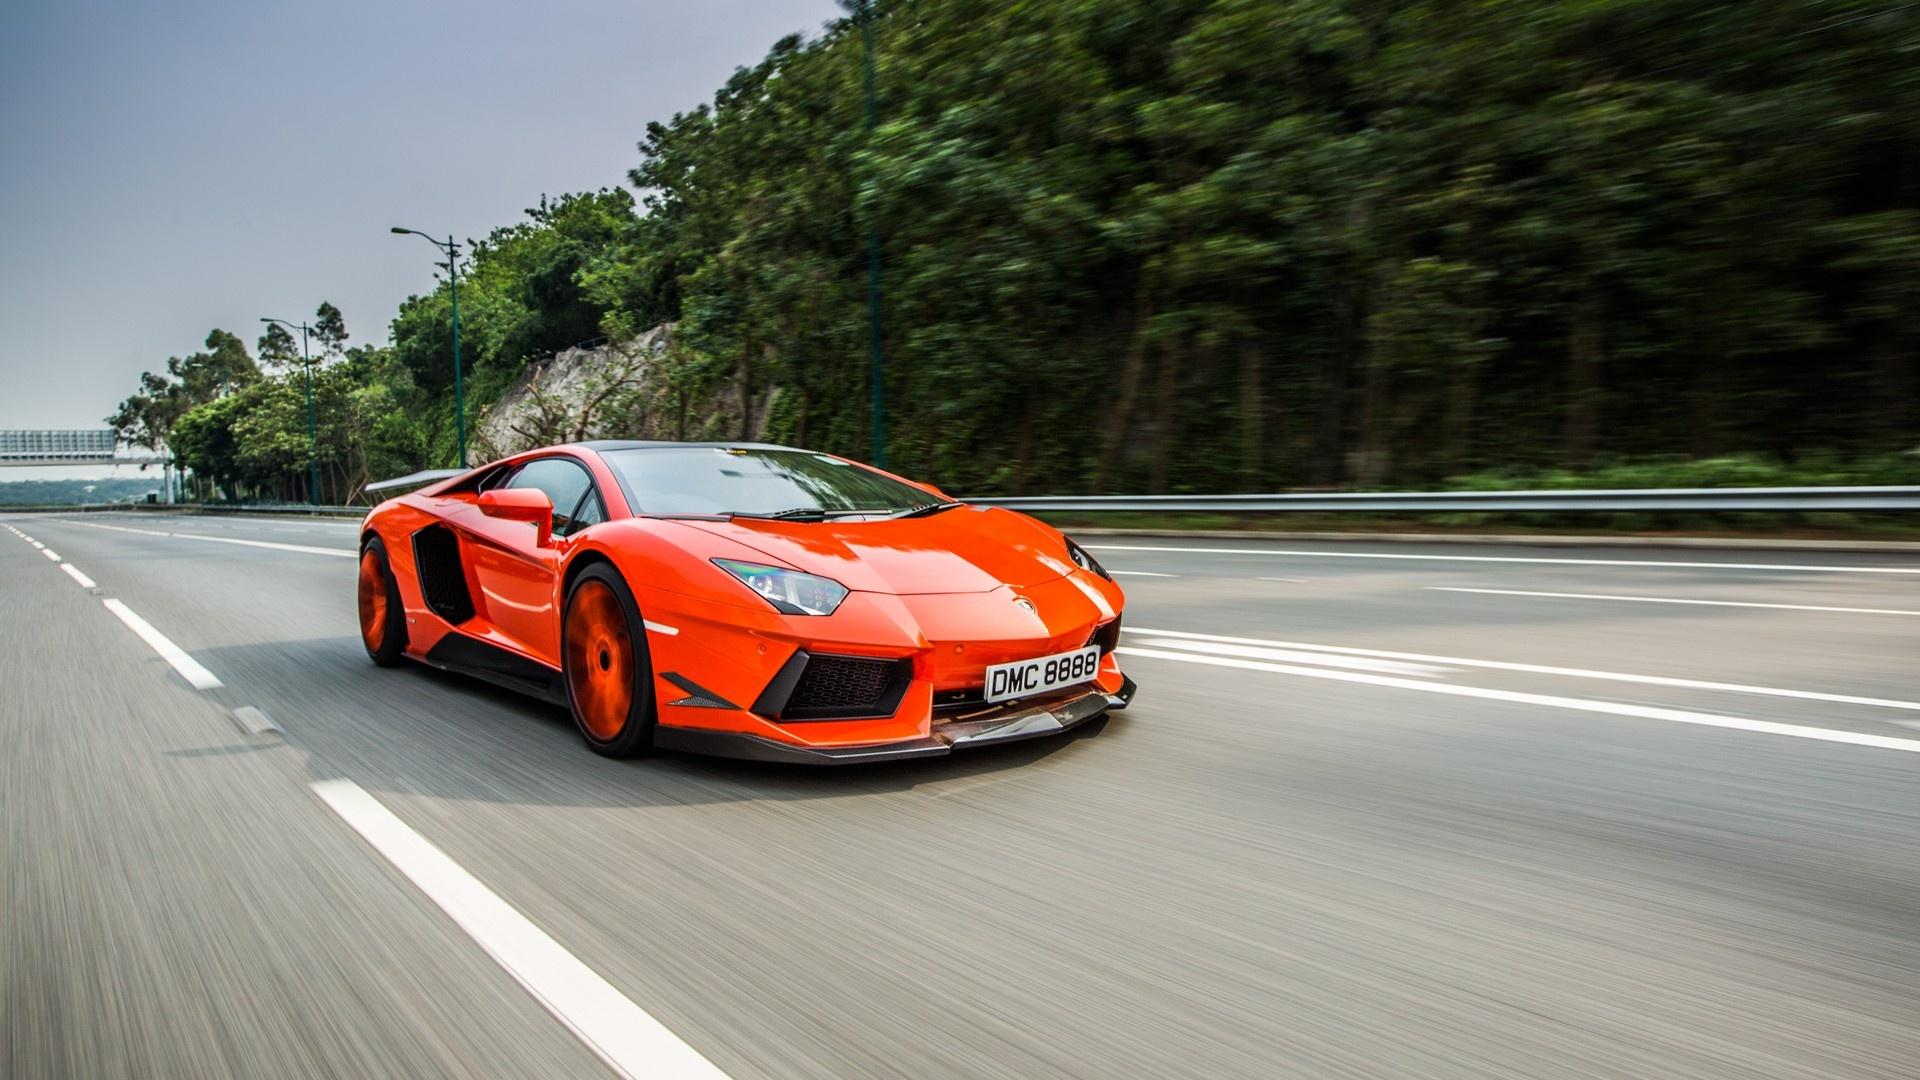 Orange Lamborghini Aventador Wallpapers - 1920x1080 - 555826